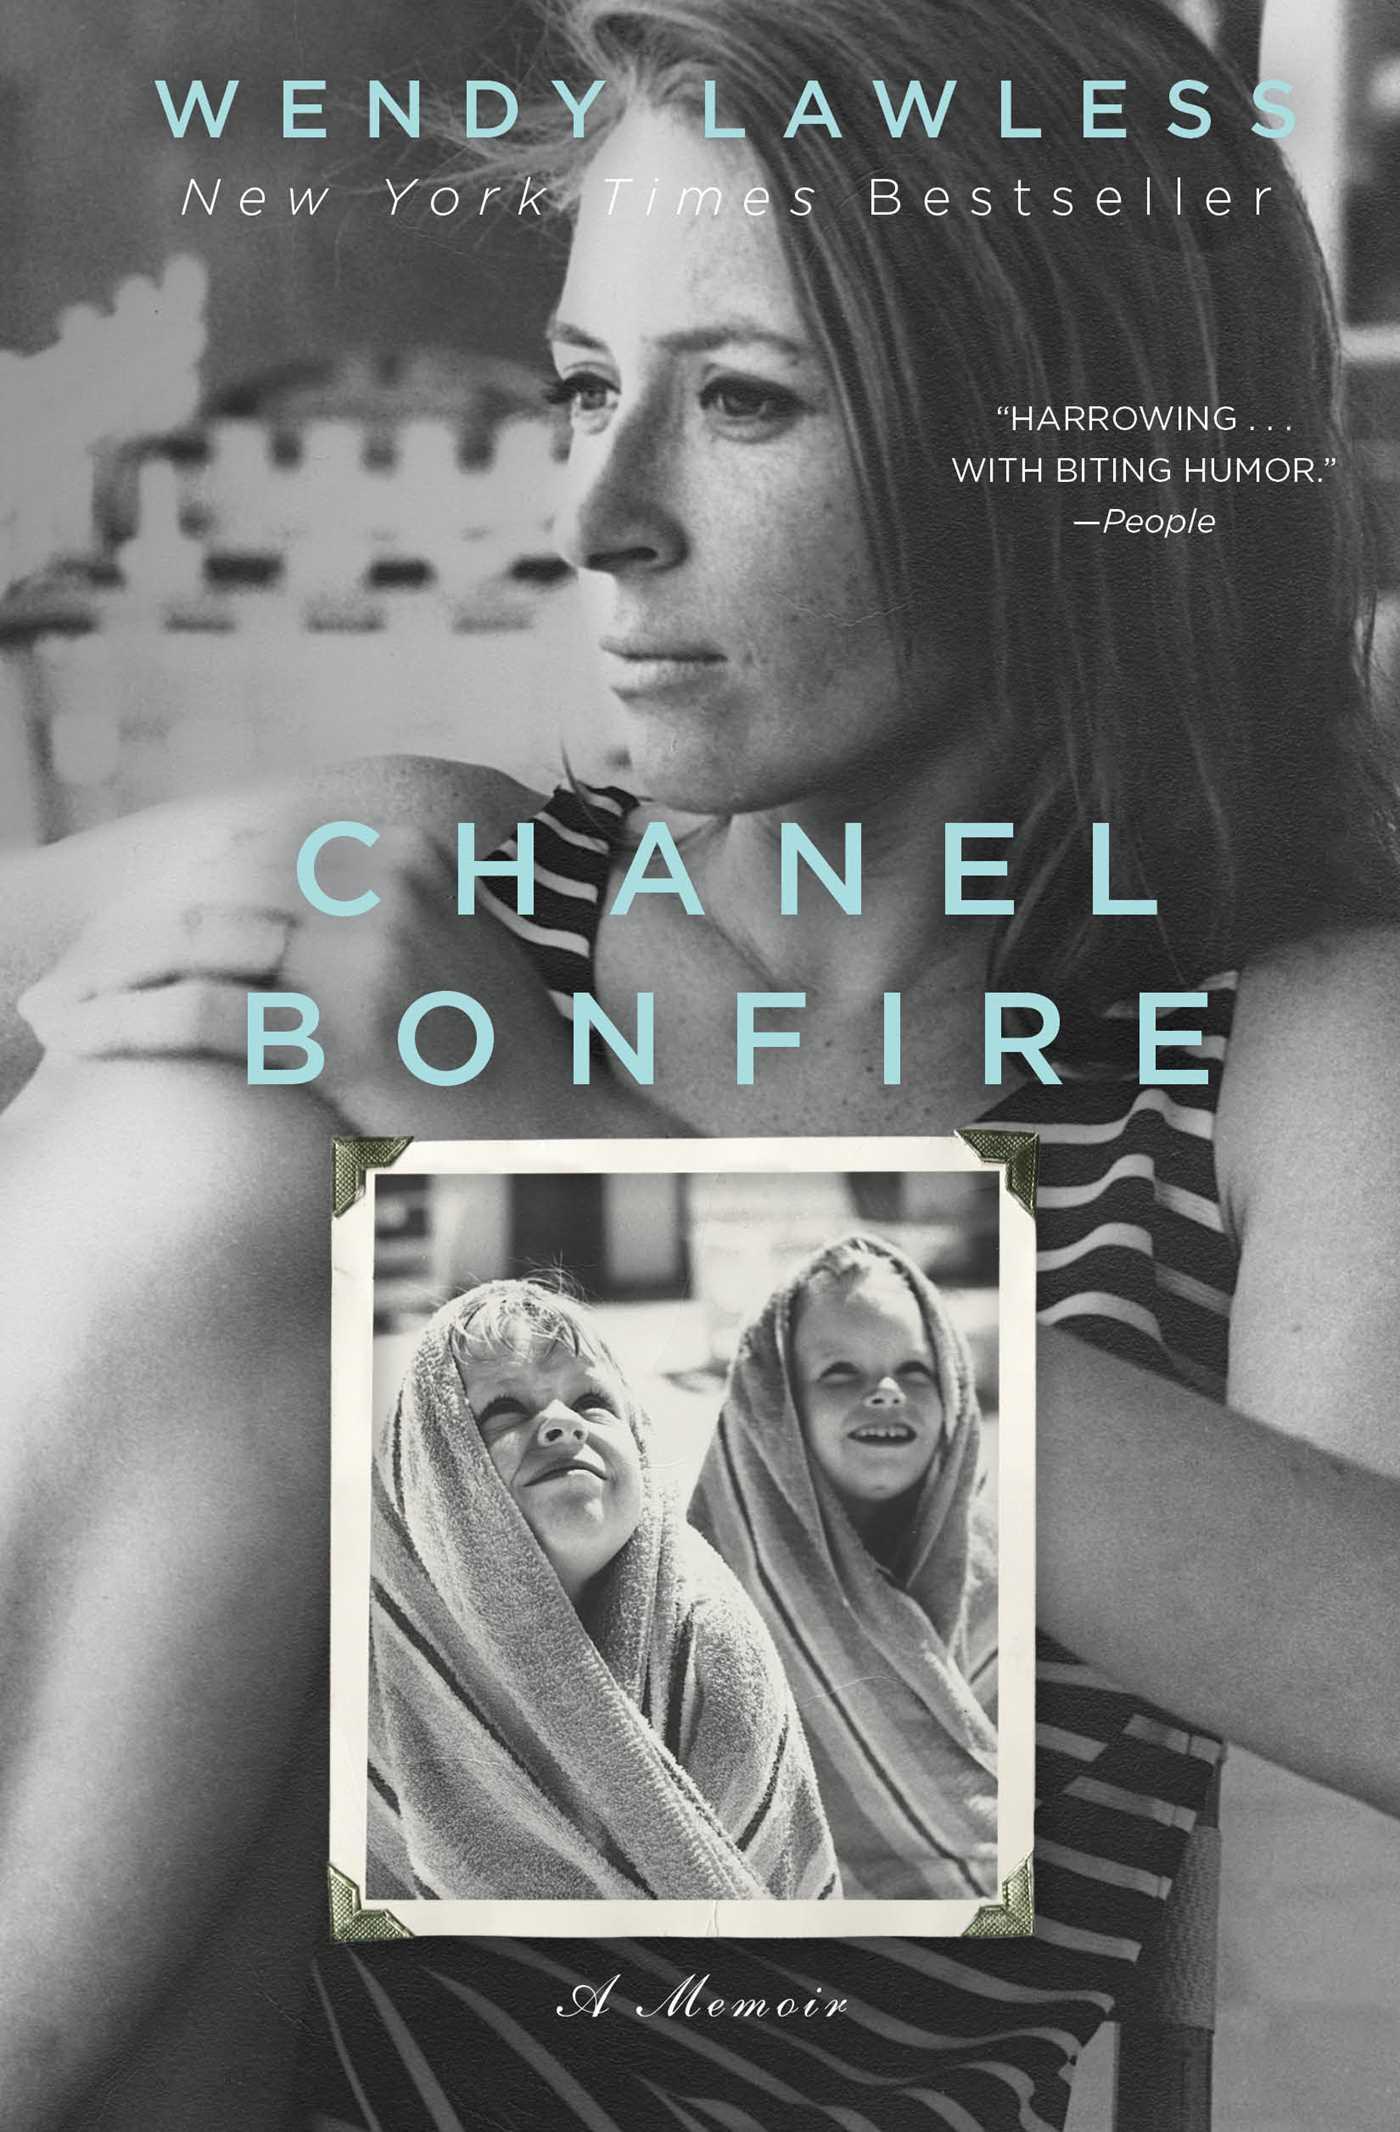 Chanel bonfire 9781451675382 hr